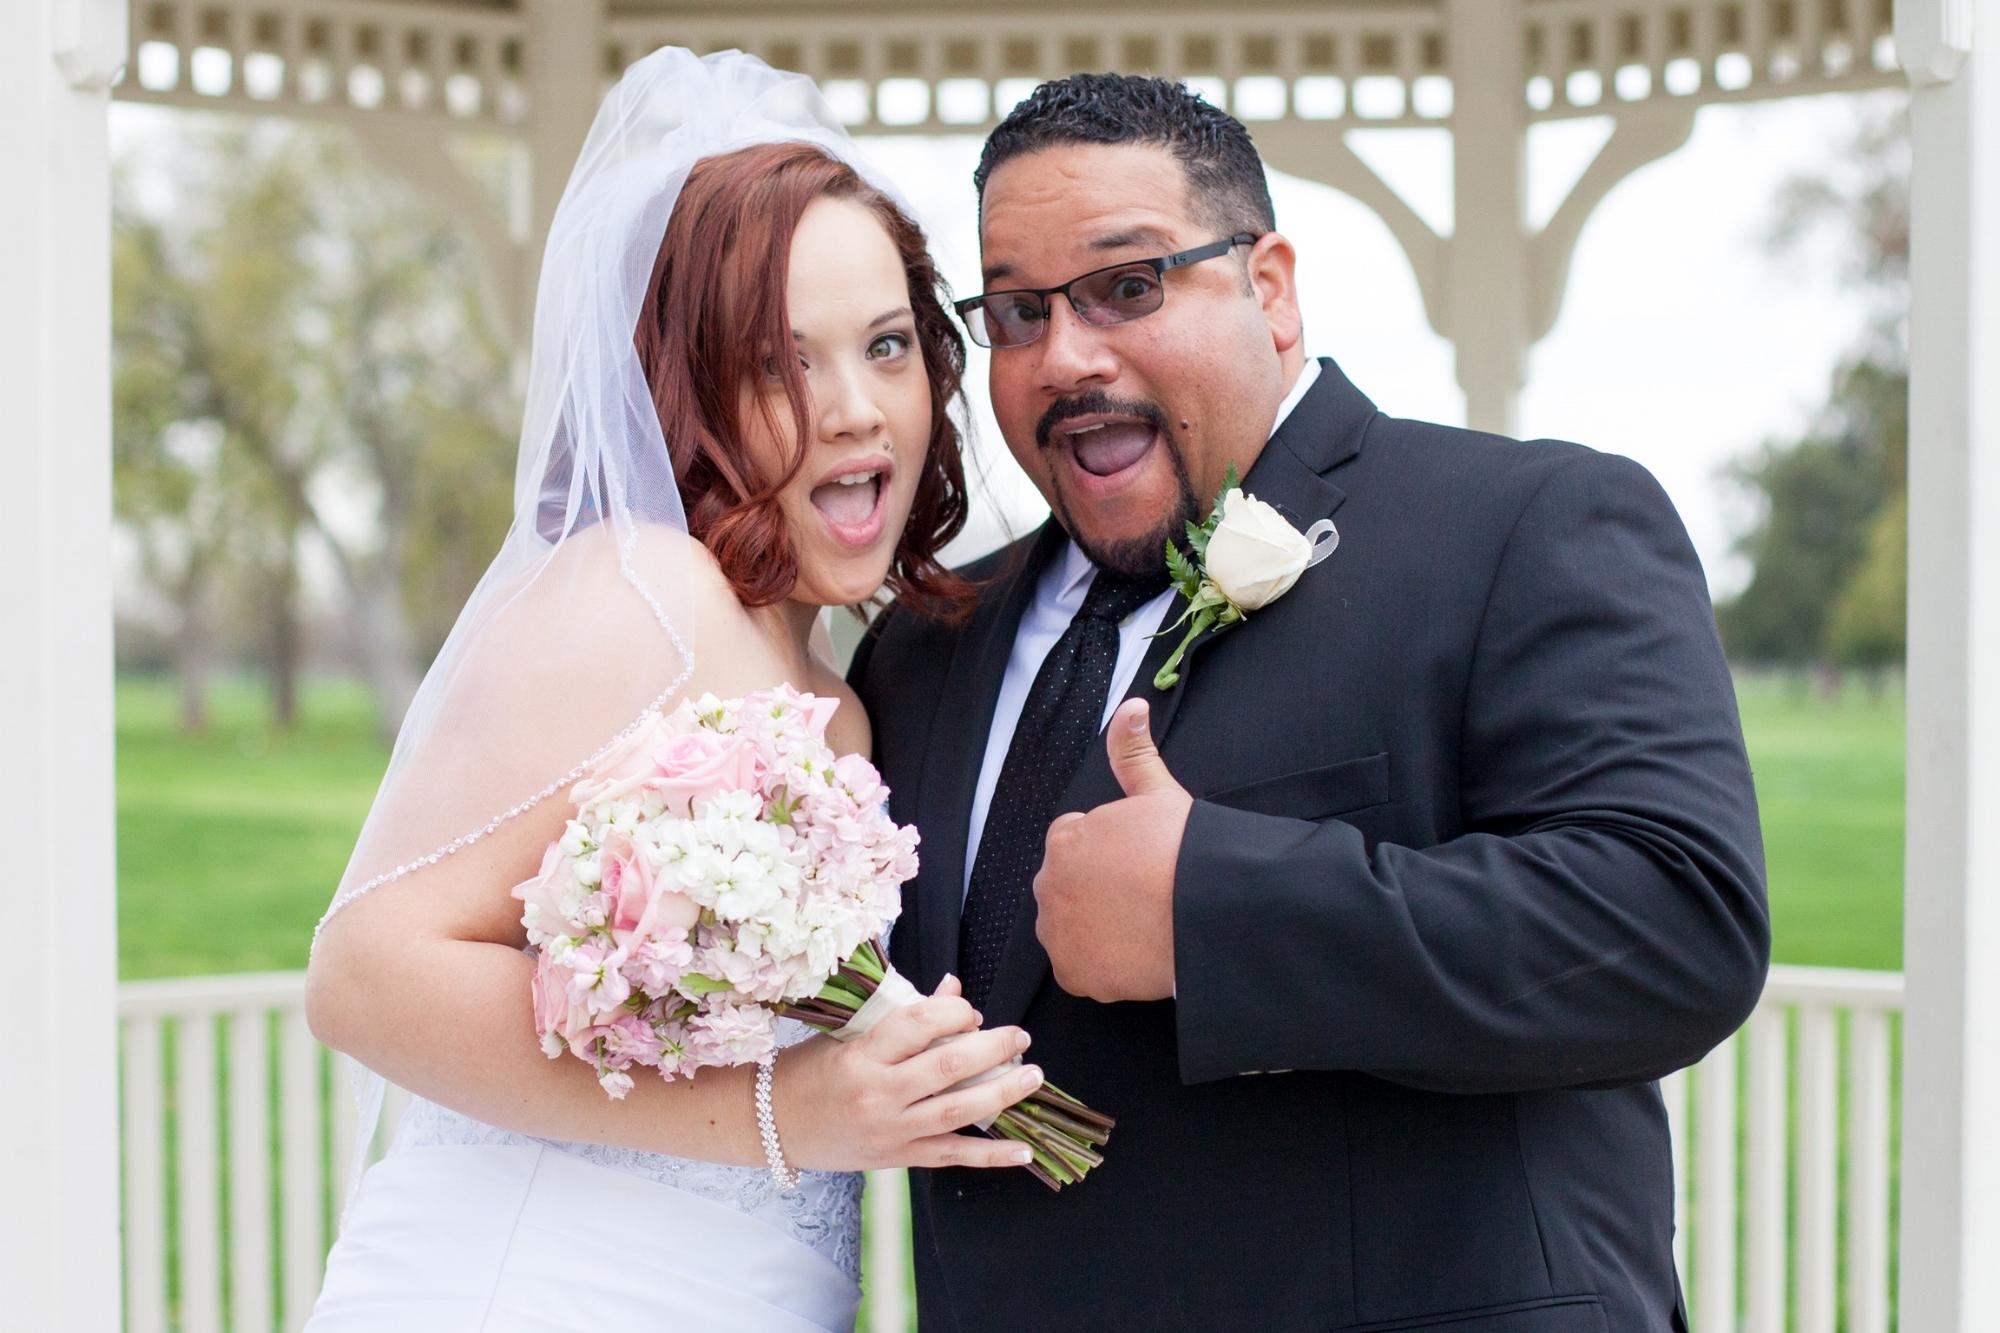 Green_Deeds Wedding-2-101.jpg